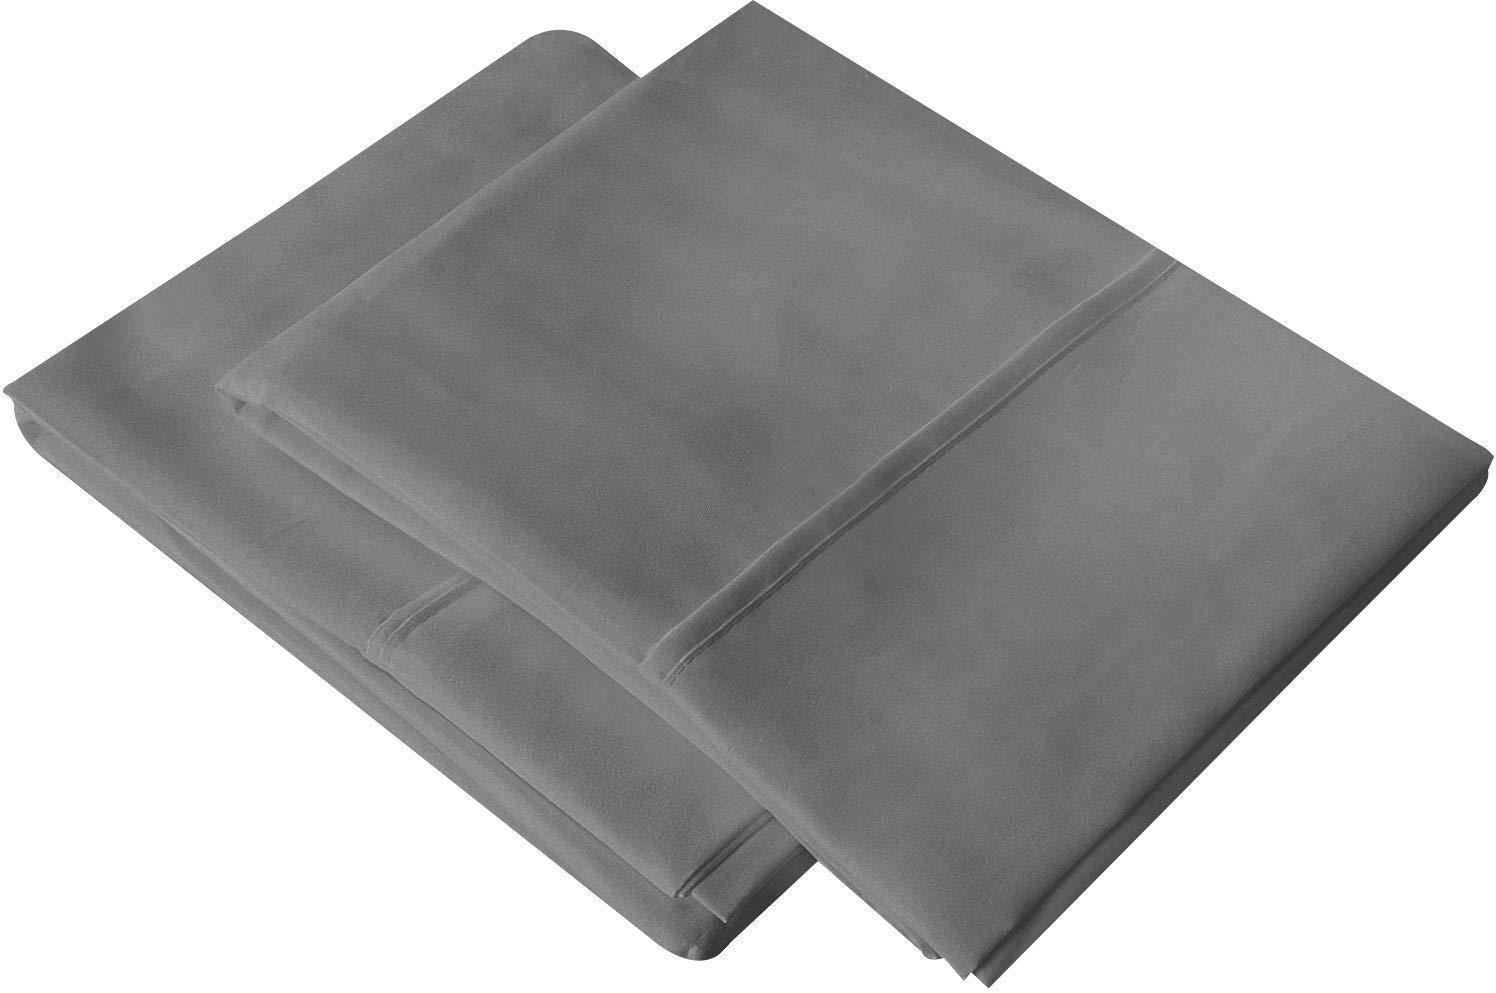 Utopia Bedding Pillowcases 2 Pack Brushed Microfiber Pillow